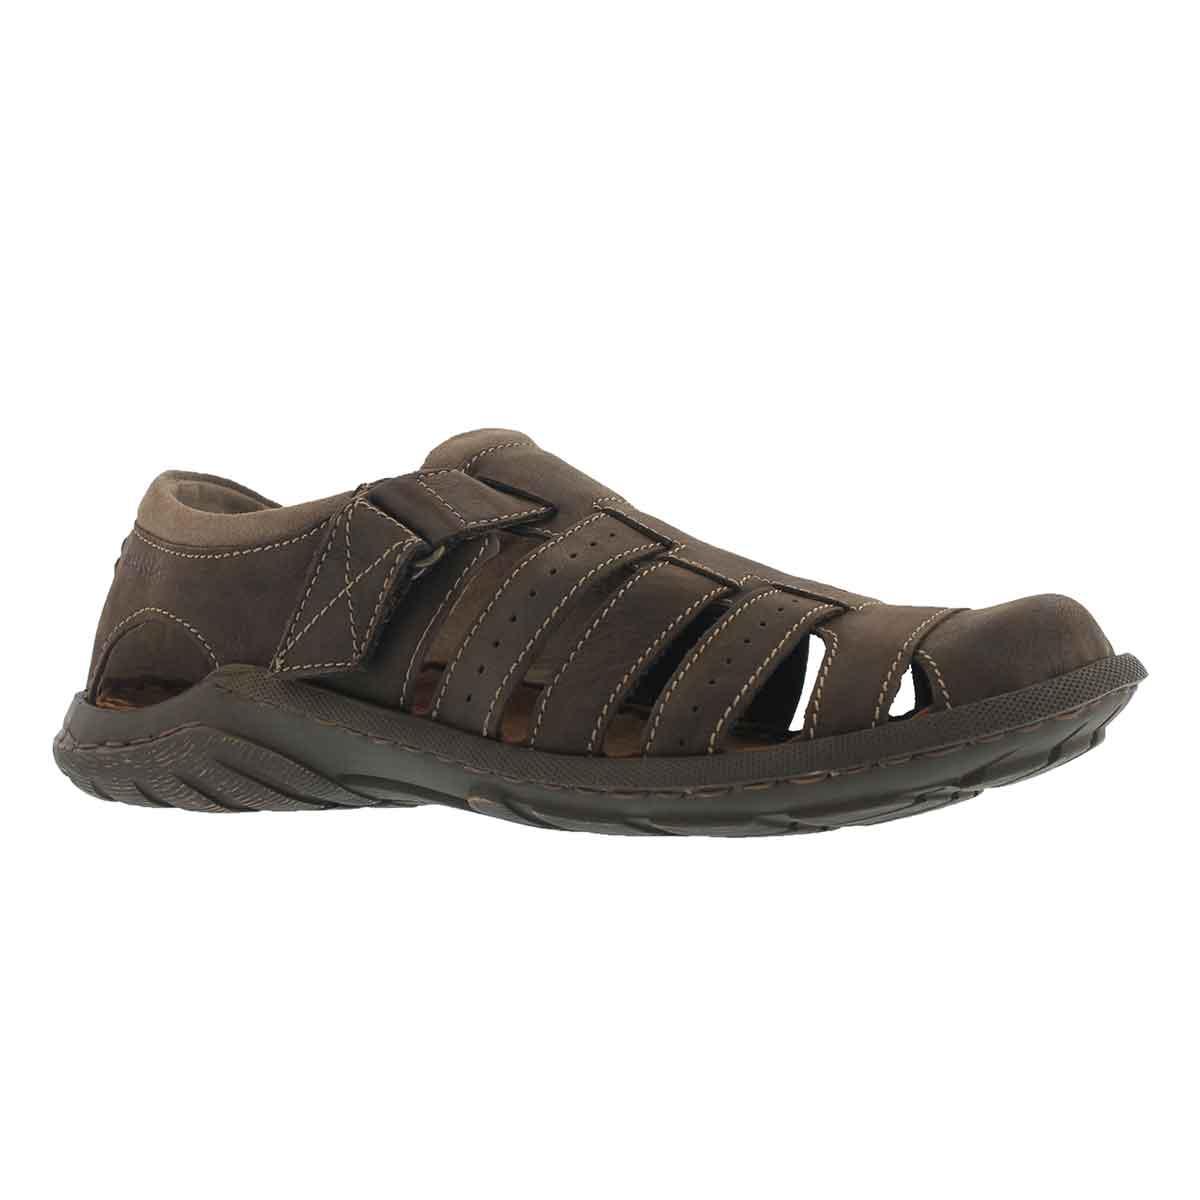 Men's LOGAN 36 moro casual sandals